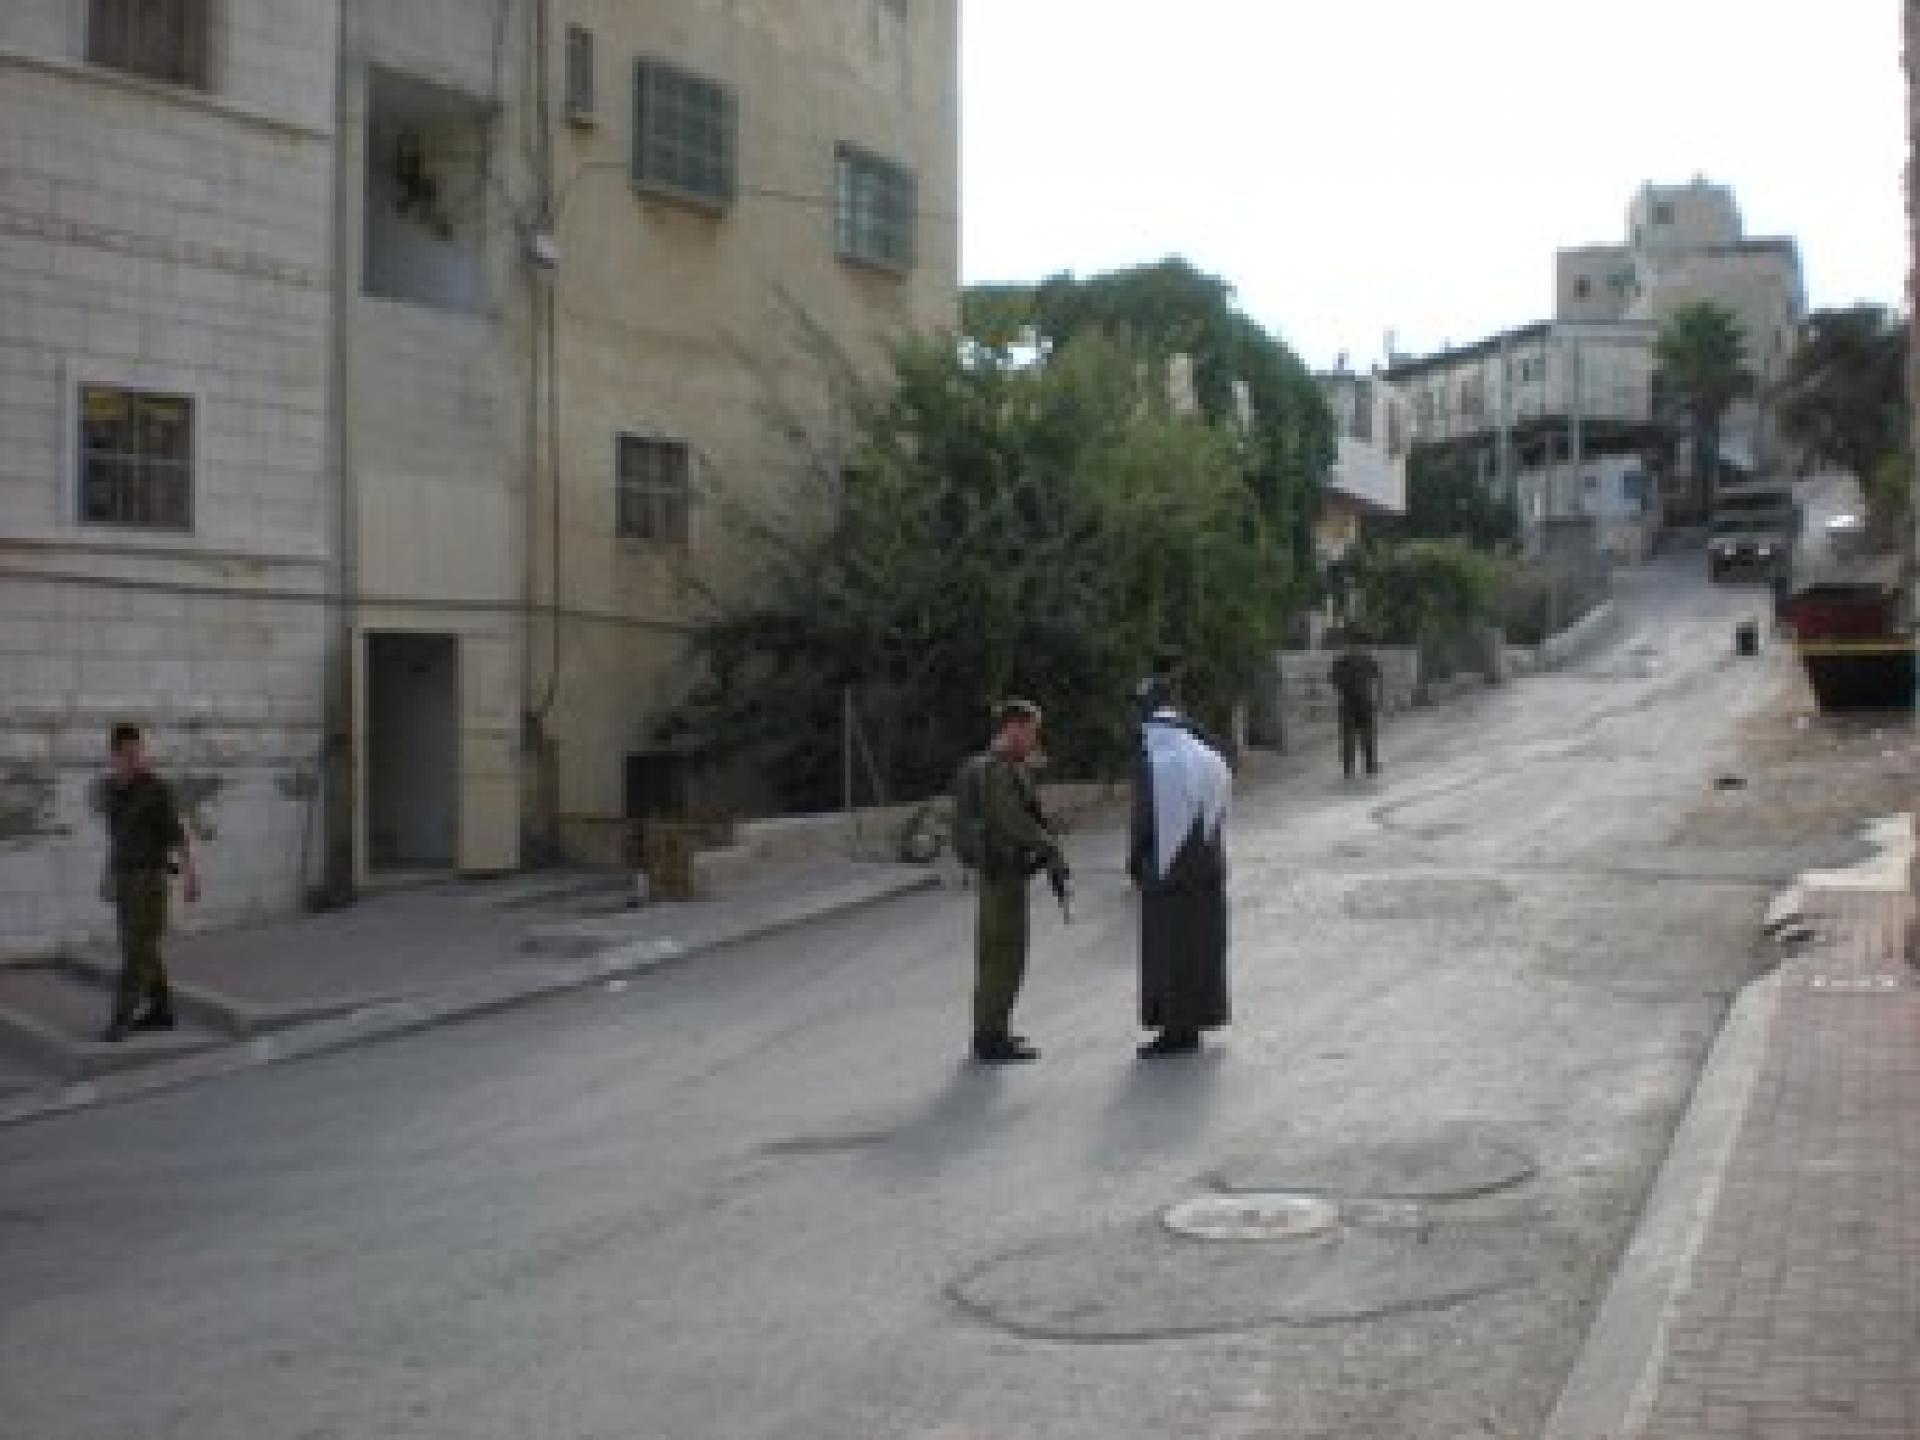 Hebron 07.09.08